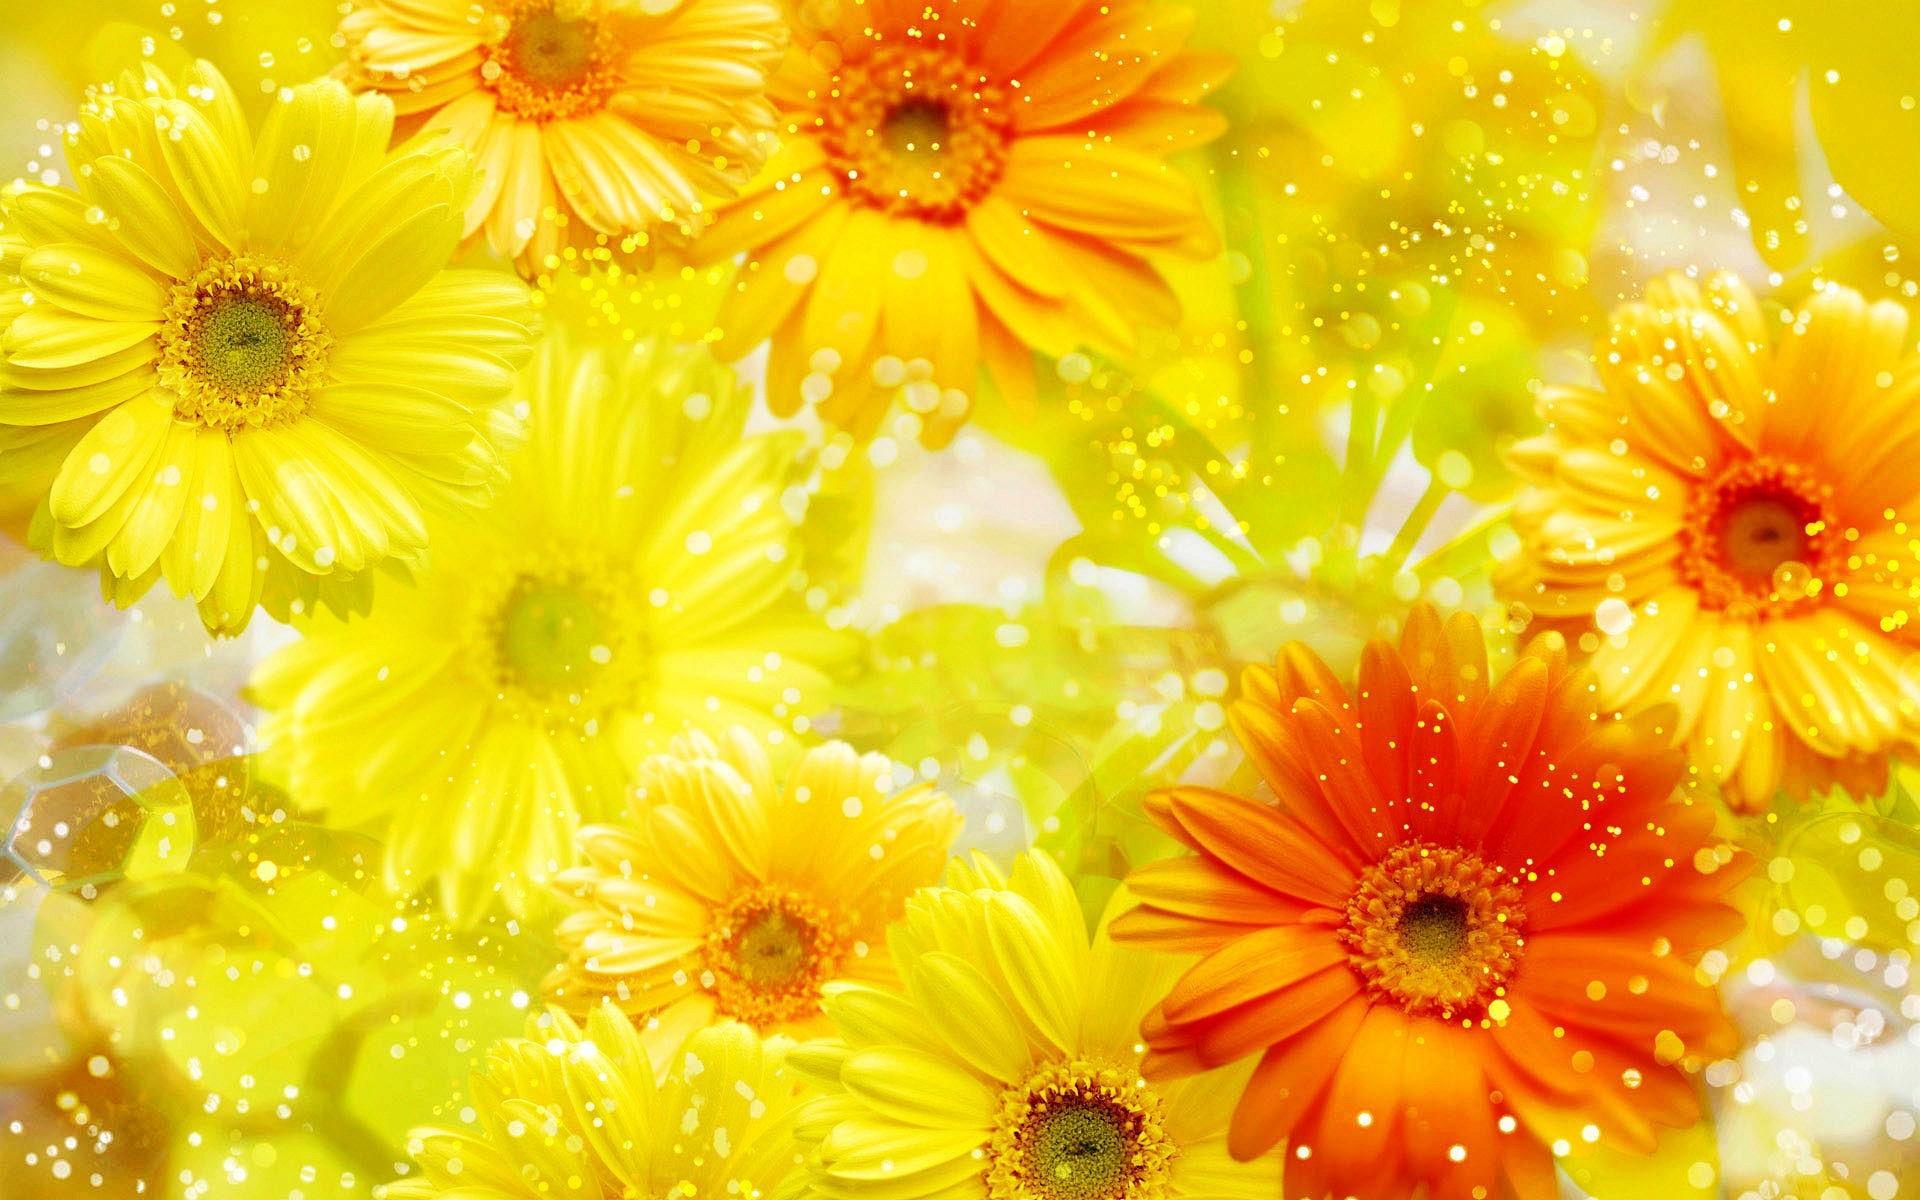 Flower Wallpaper Colorful Flower Wallpaper Image 17741